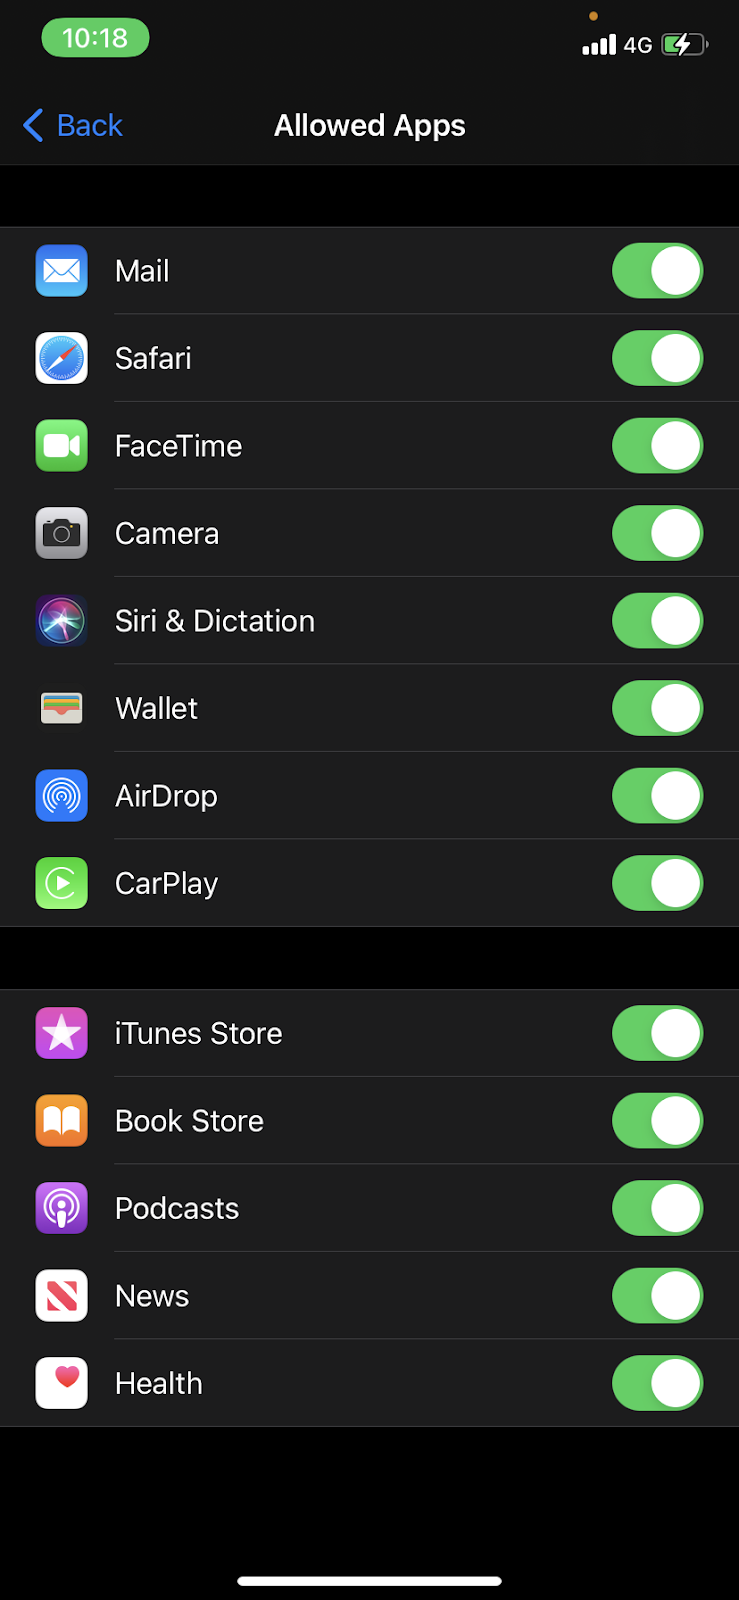 hide safari icon - The Allowed Apps list, with the Safari toggle Switch